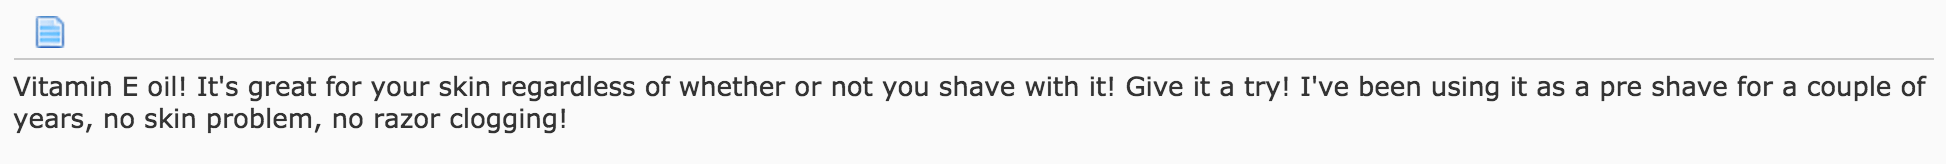 pre-shave-oil-testimonial-6